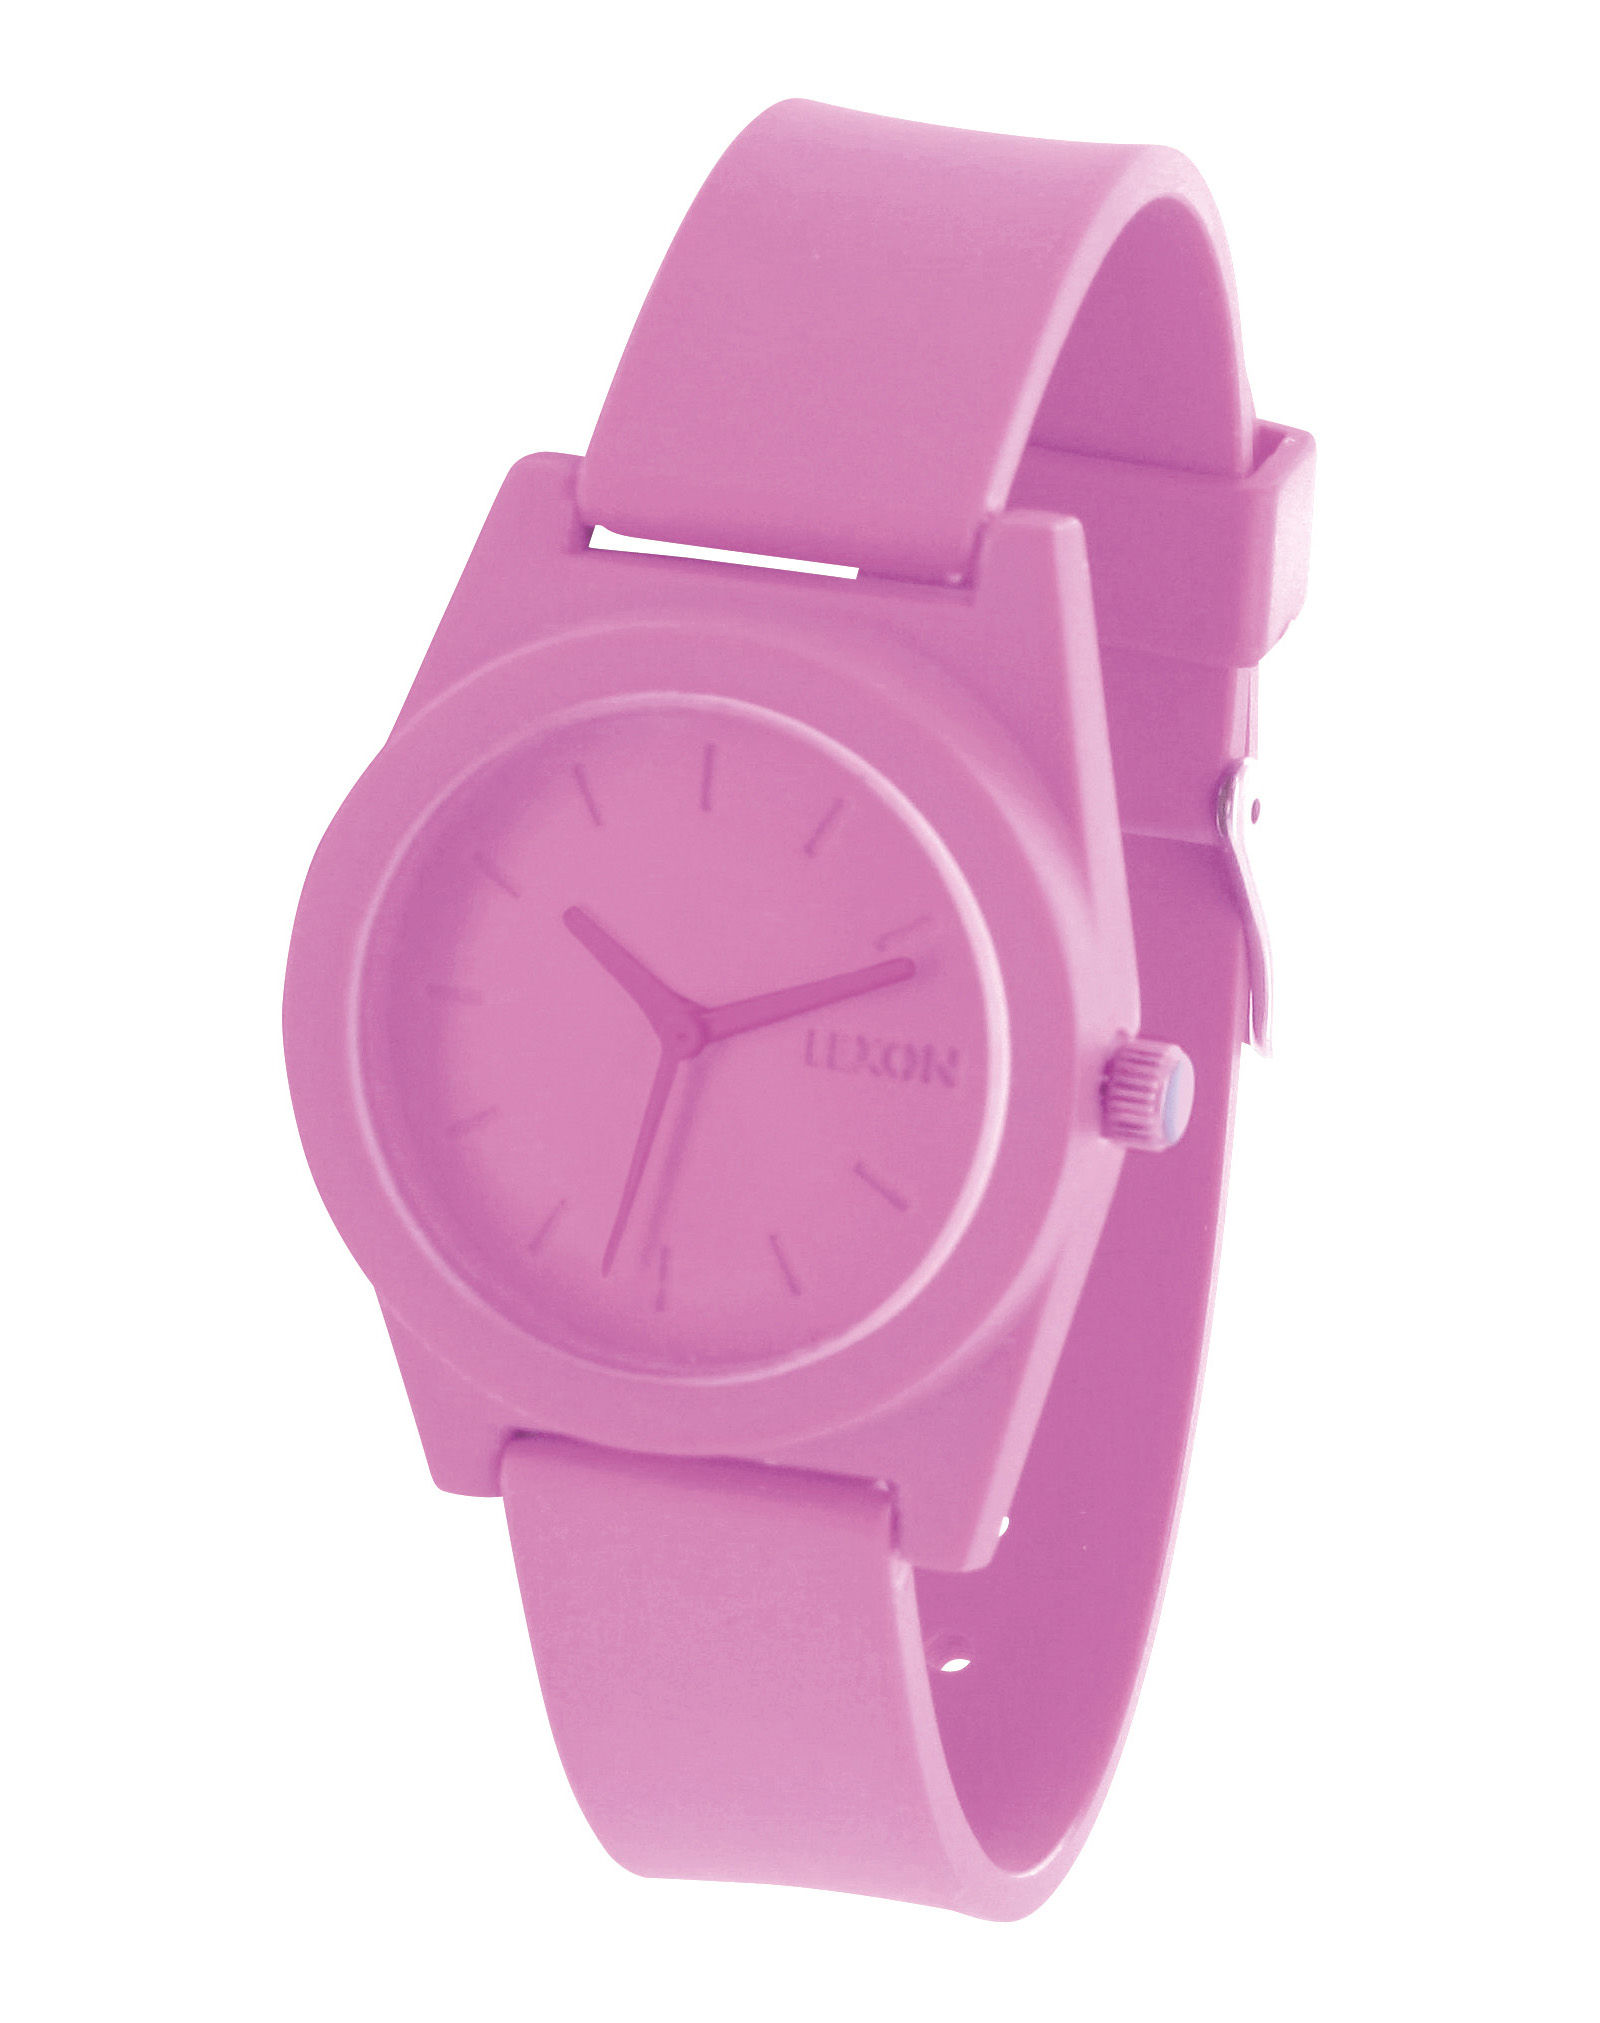 Accessoires - Uhren - Spring Uhr groß - Lexon - Rosa - Polykarbonat